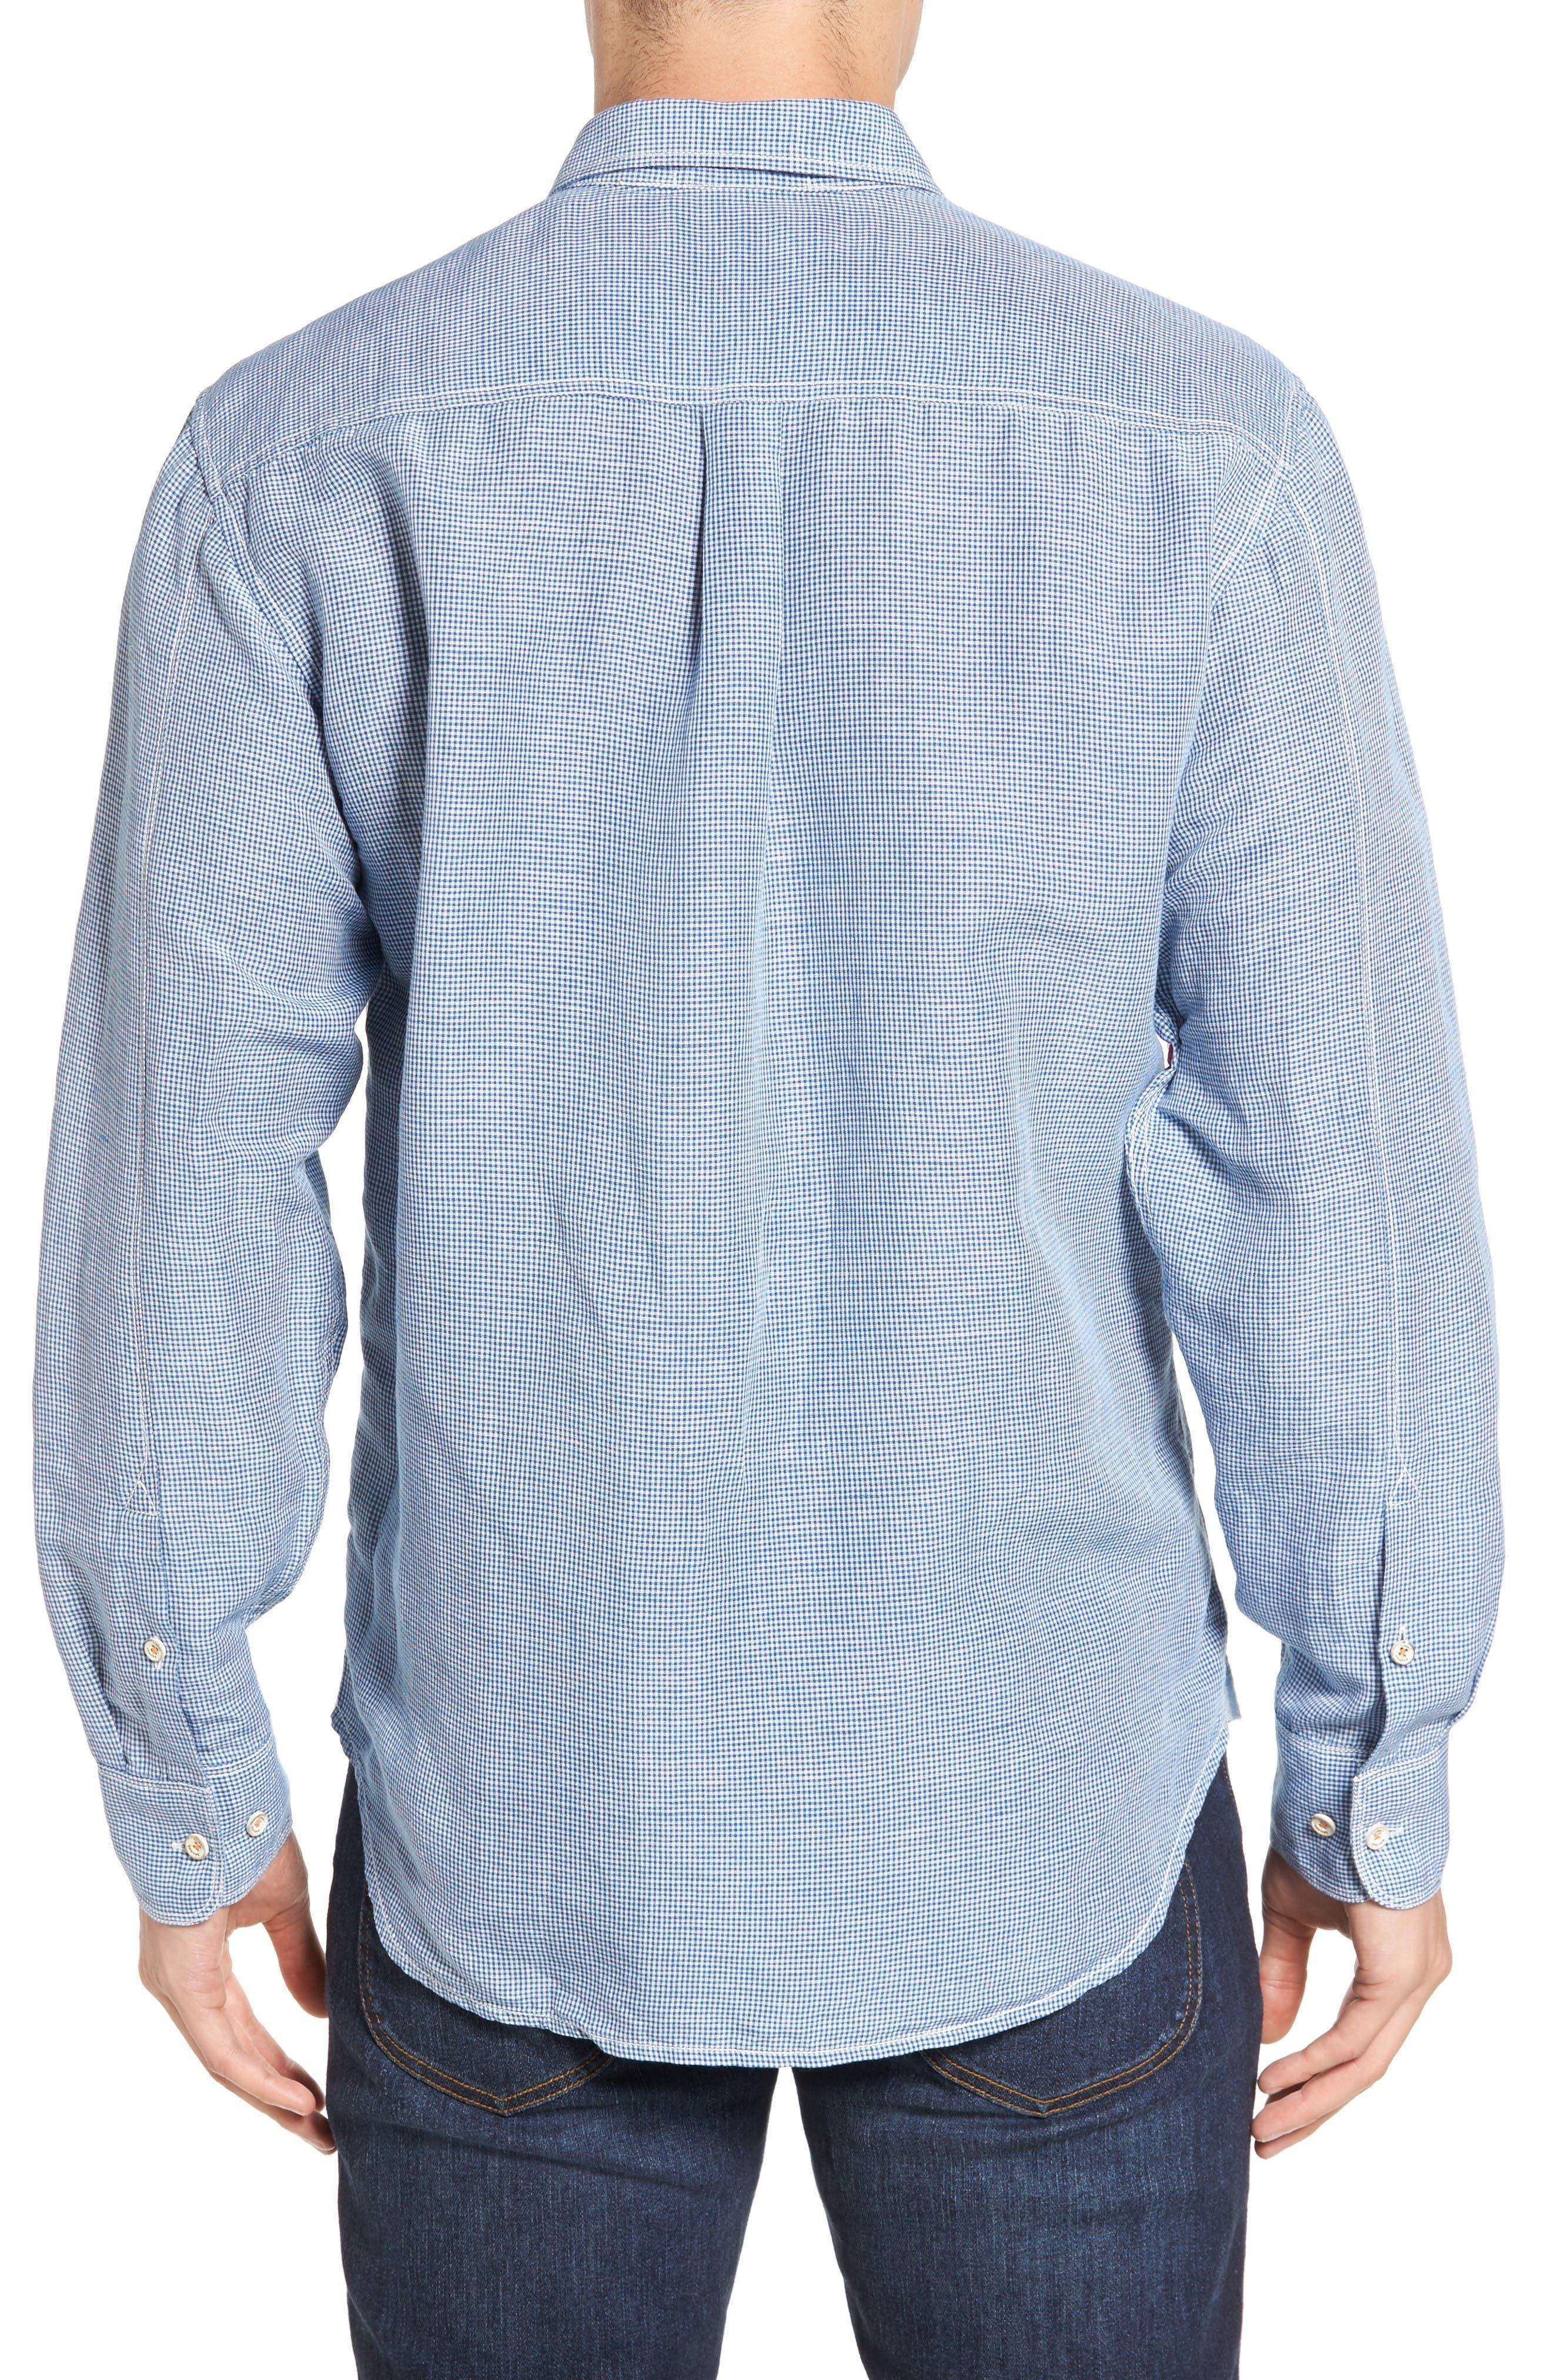 Sand Linen Island Modern Fit Sport Shirt,                             Alternate thumbnail 2, color,                             Bering Blue